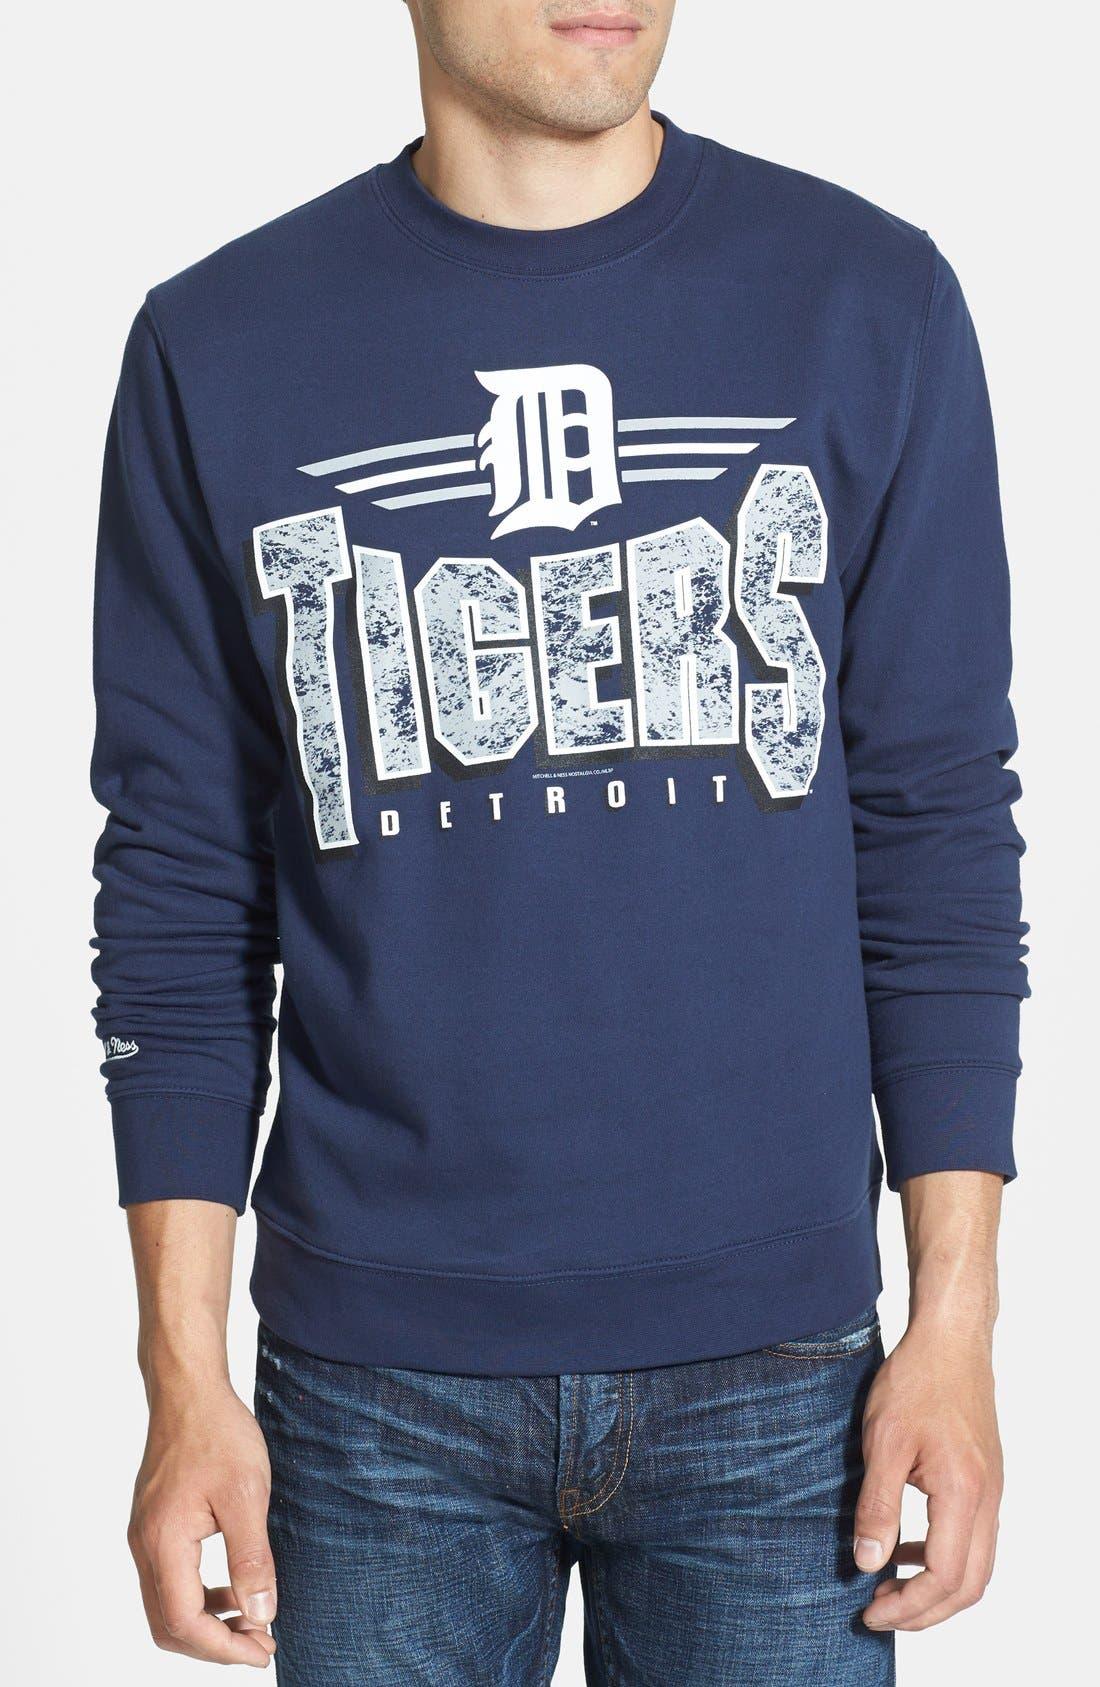 Alternate Image 1 Selected - Mitchell & Ness 'Detroit Tigers' Crewneck Sweatshirt